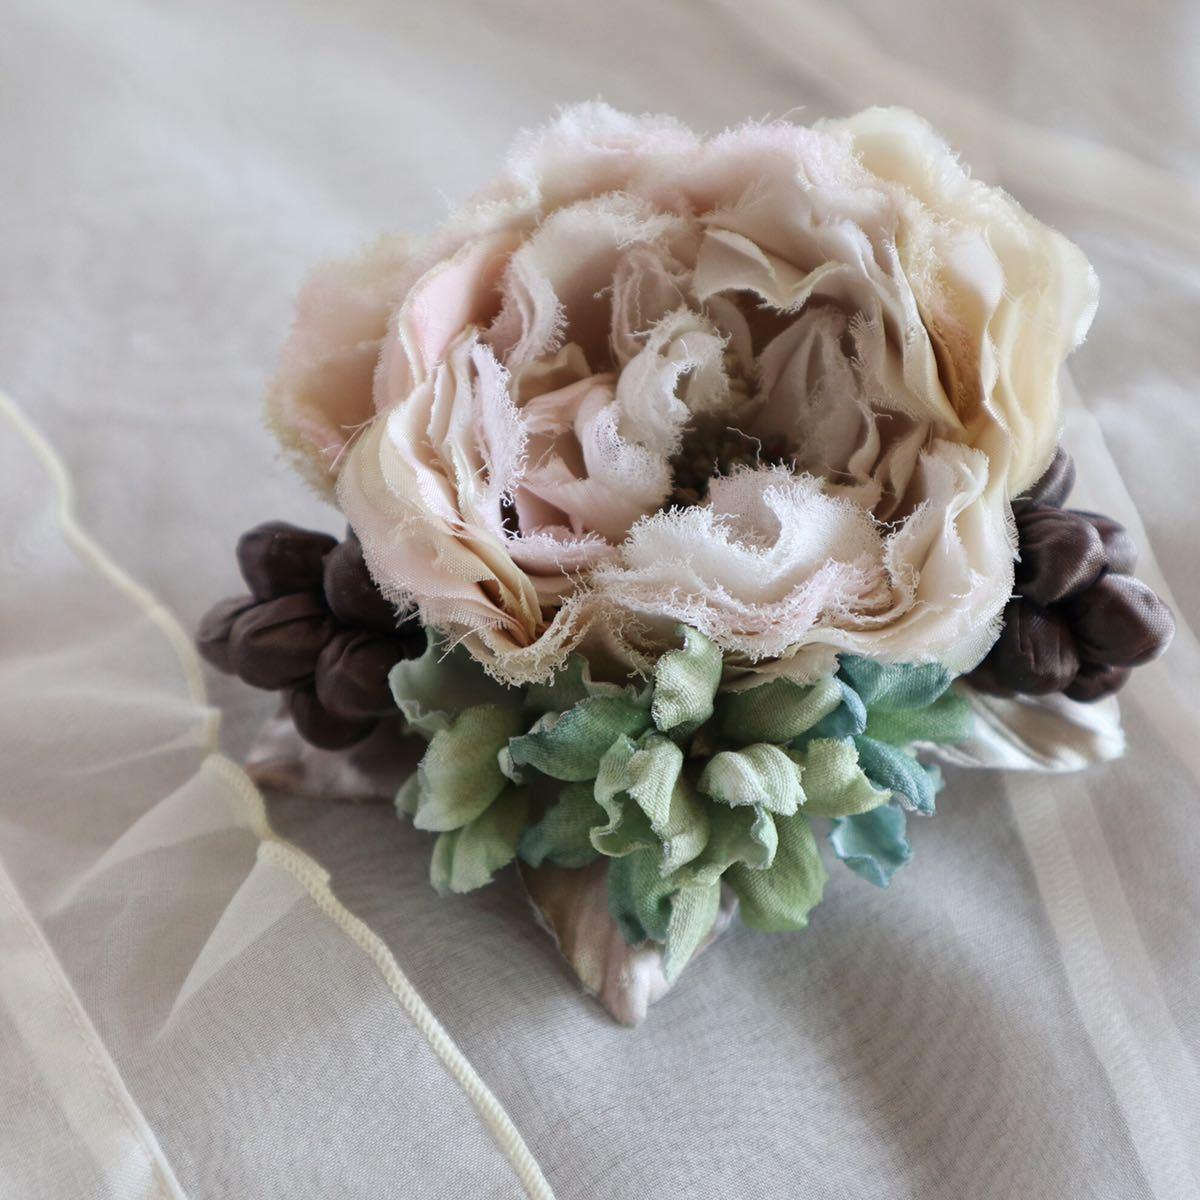 *kashun* ハンドメイド 布花のアンティークカラーのミニブーケ風コサージュ6 ピンクのバラとアジサイ /染花/卒園式/卒業式/入学式_画像2